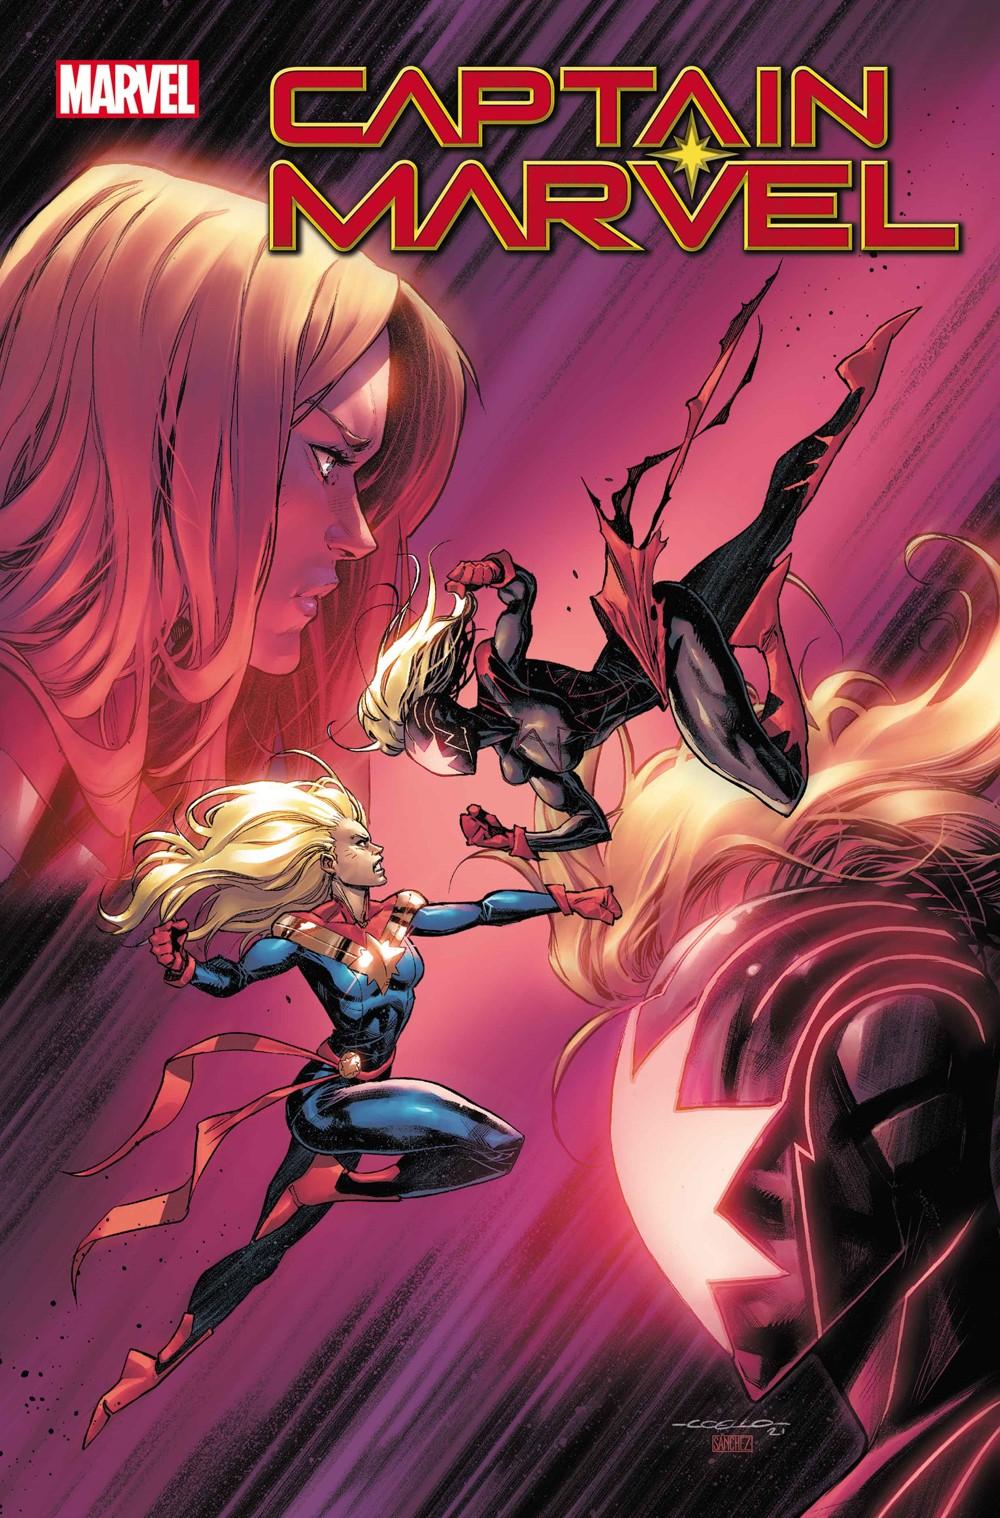 CAPMARV2019032_COV Marvel Comics September 2021 Solicitations